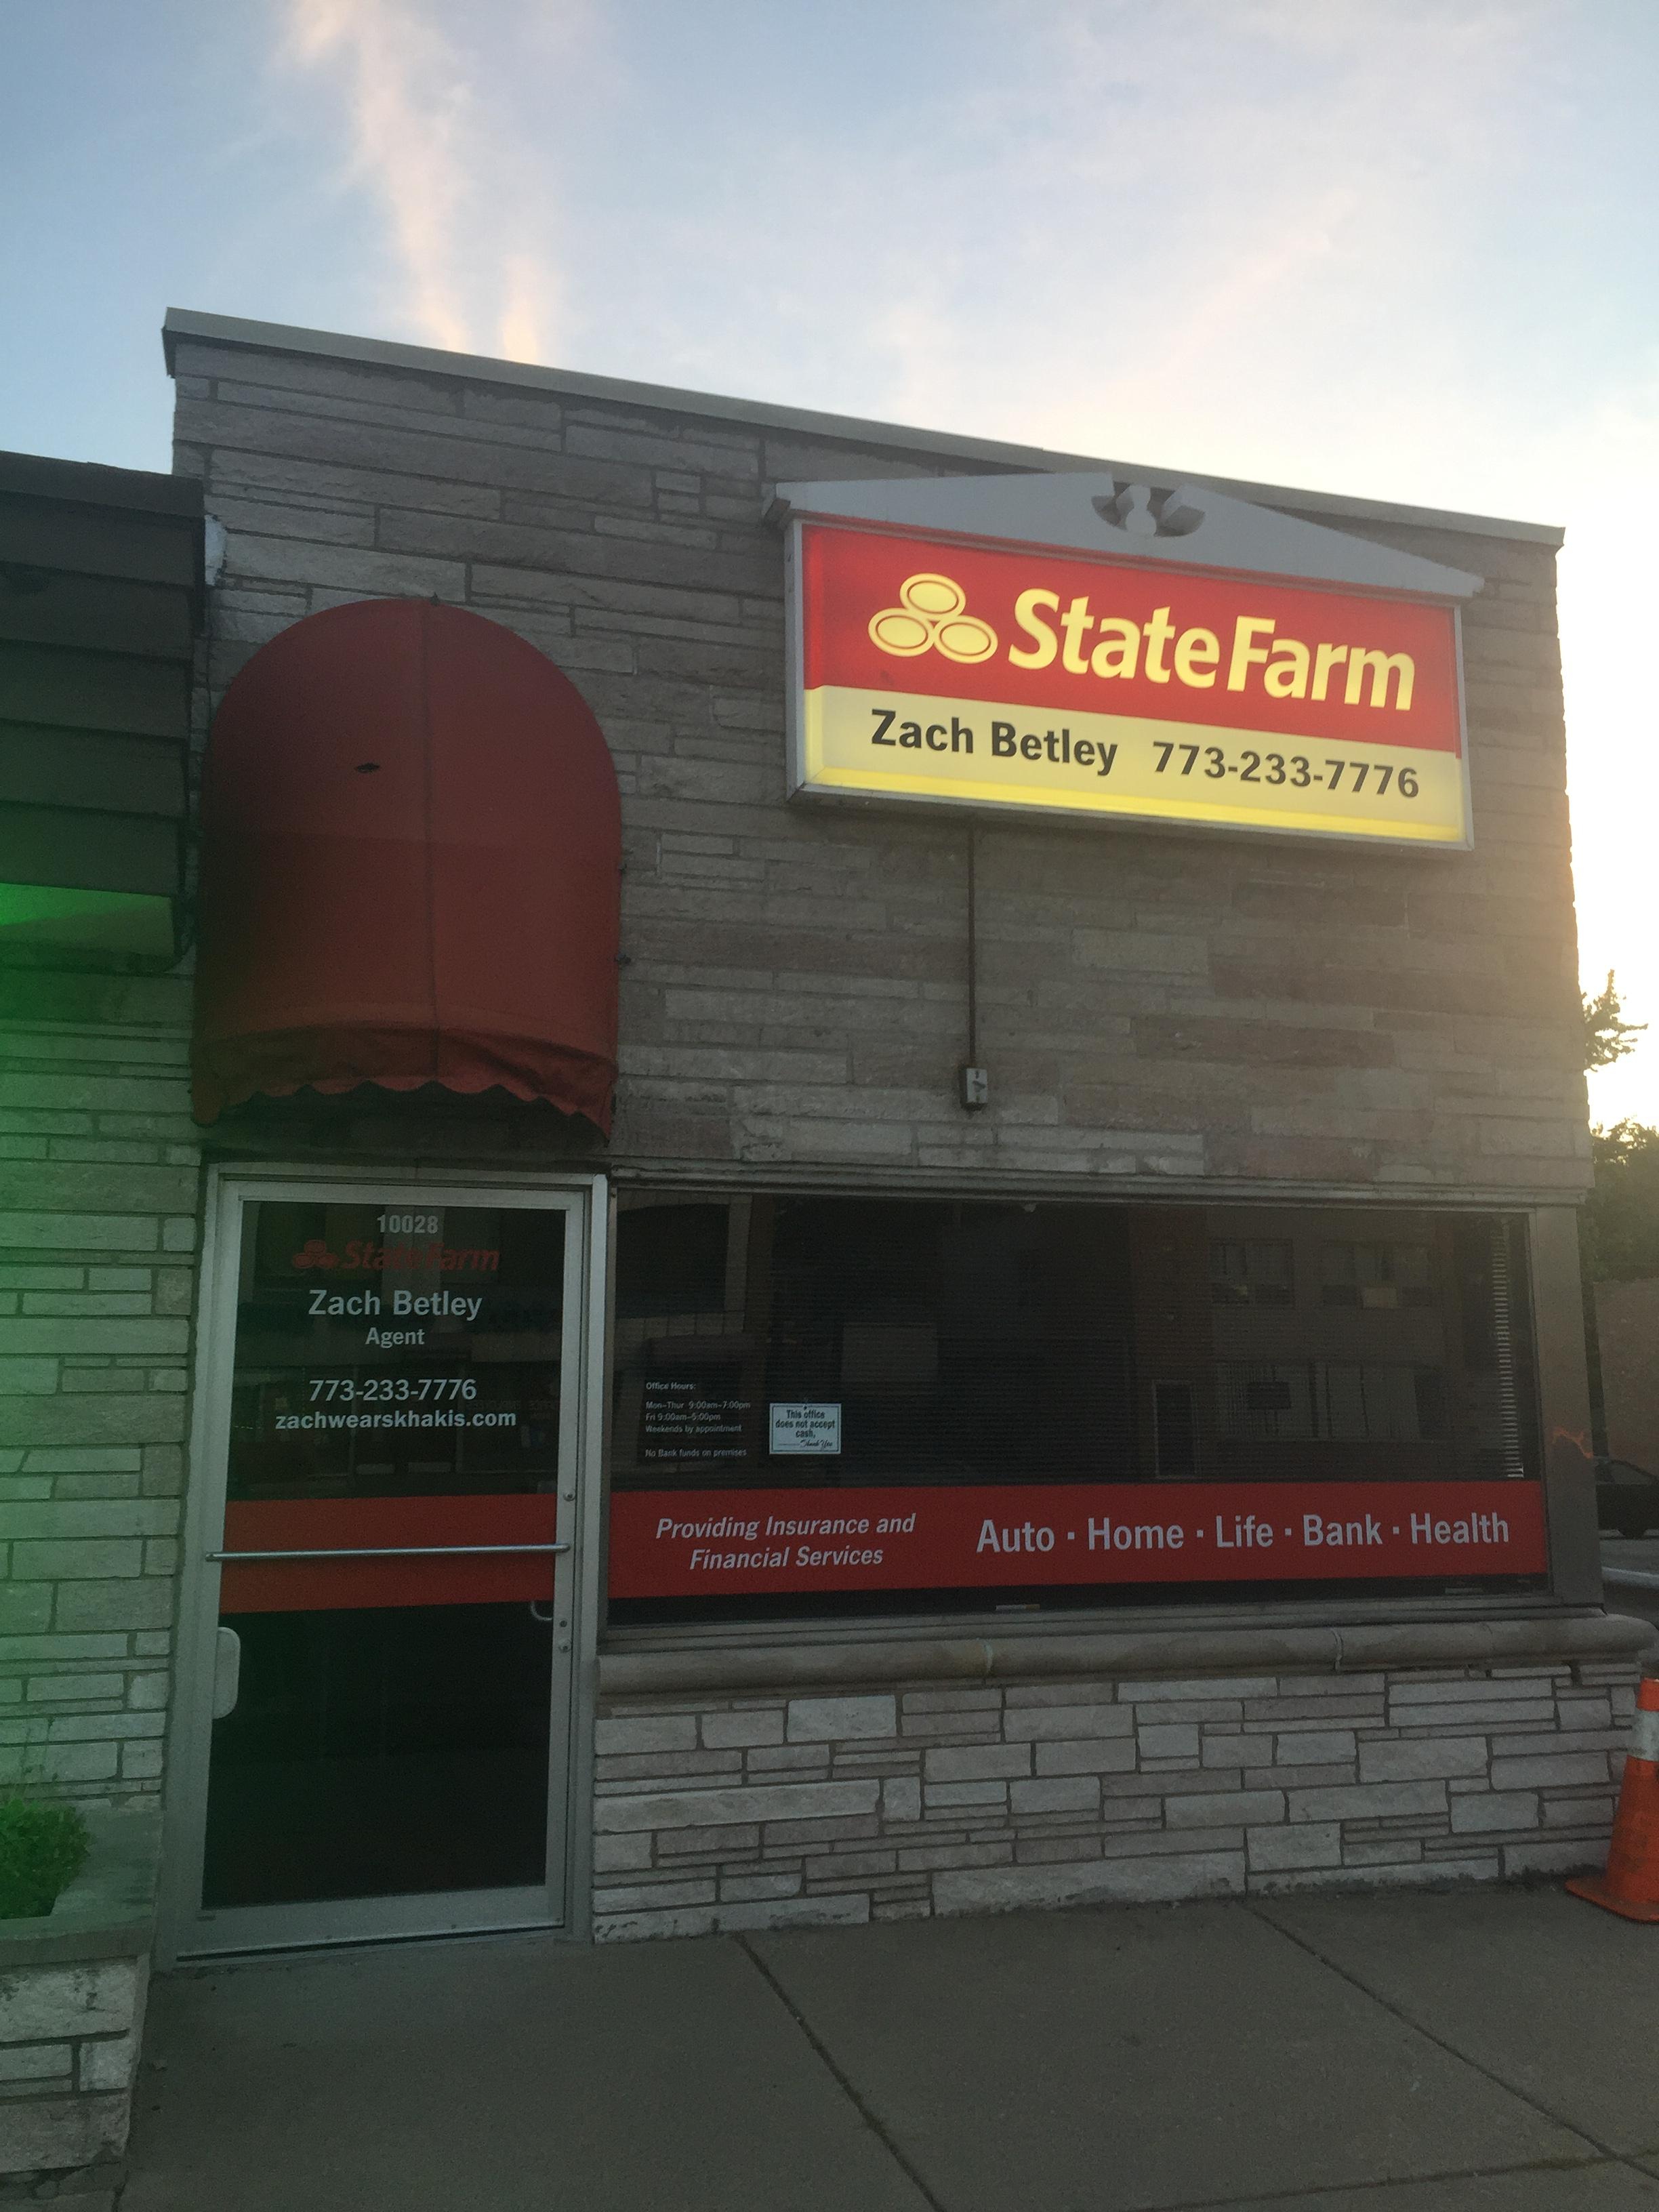 Zach Betley - State Farm Insurance Agent image 2